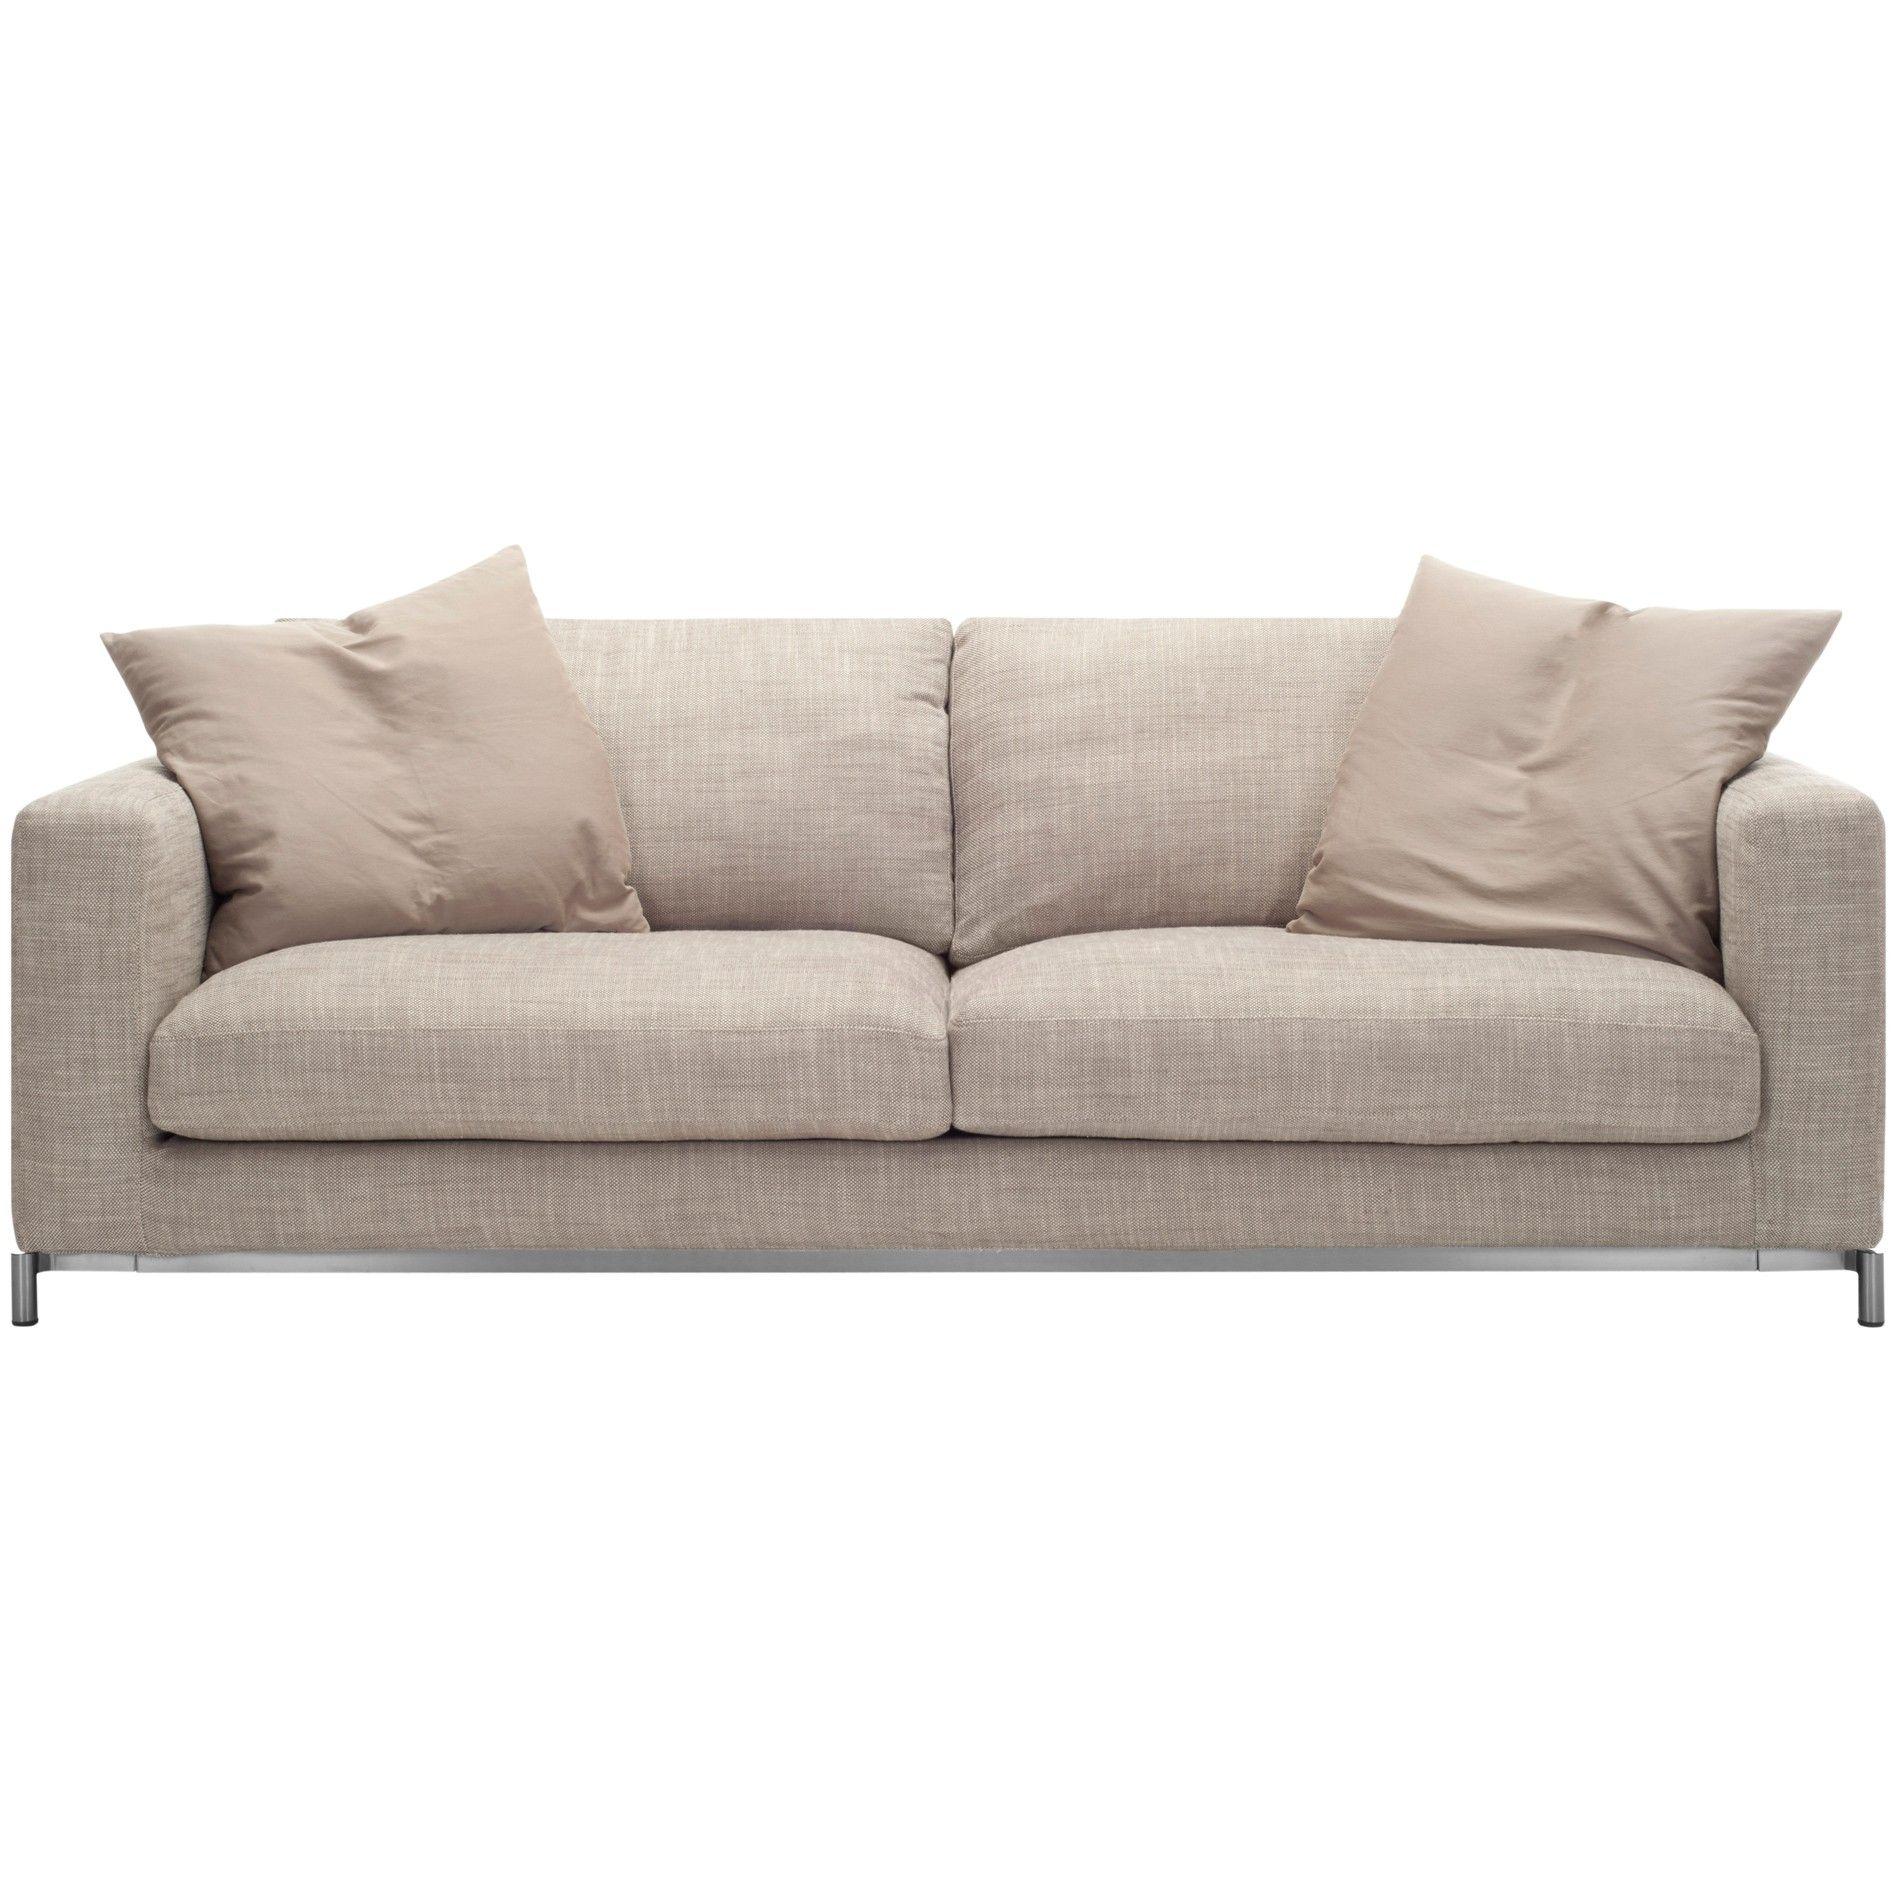 Simpson Sofa - Sofas - Living Room | Safavieh Home | couch ...